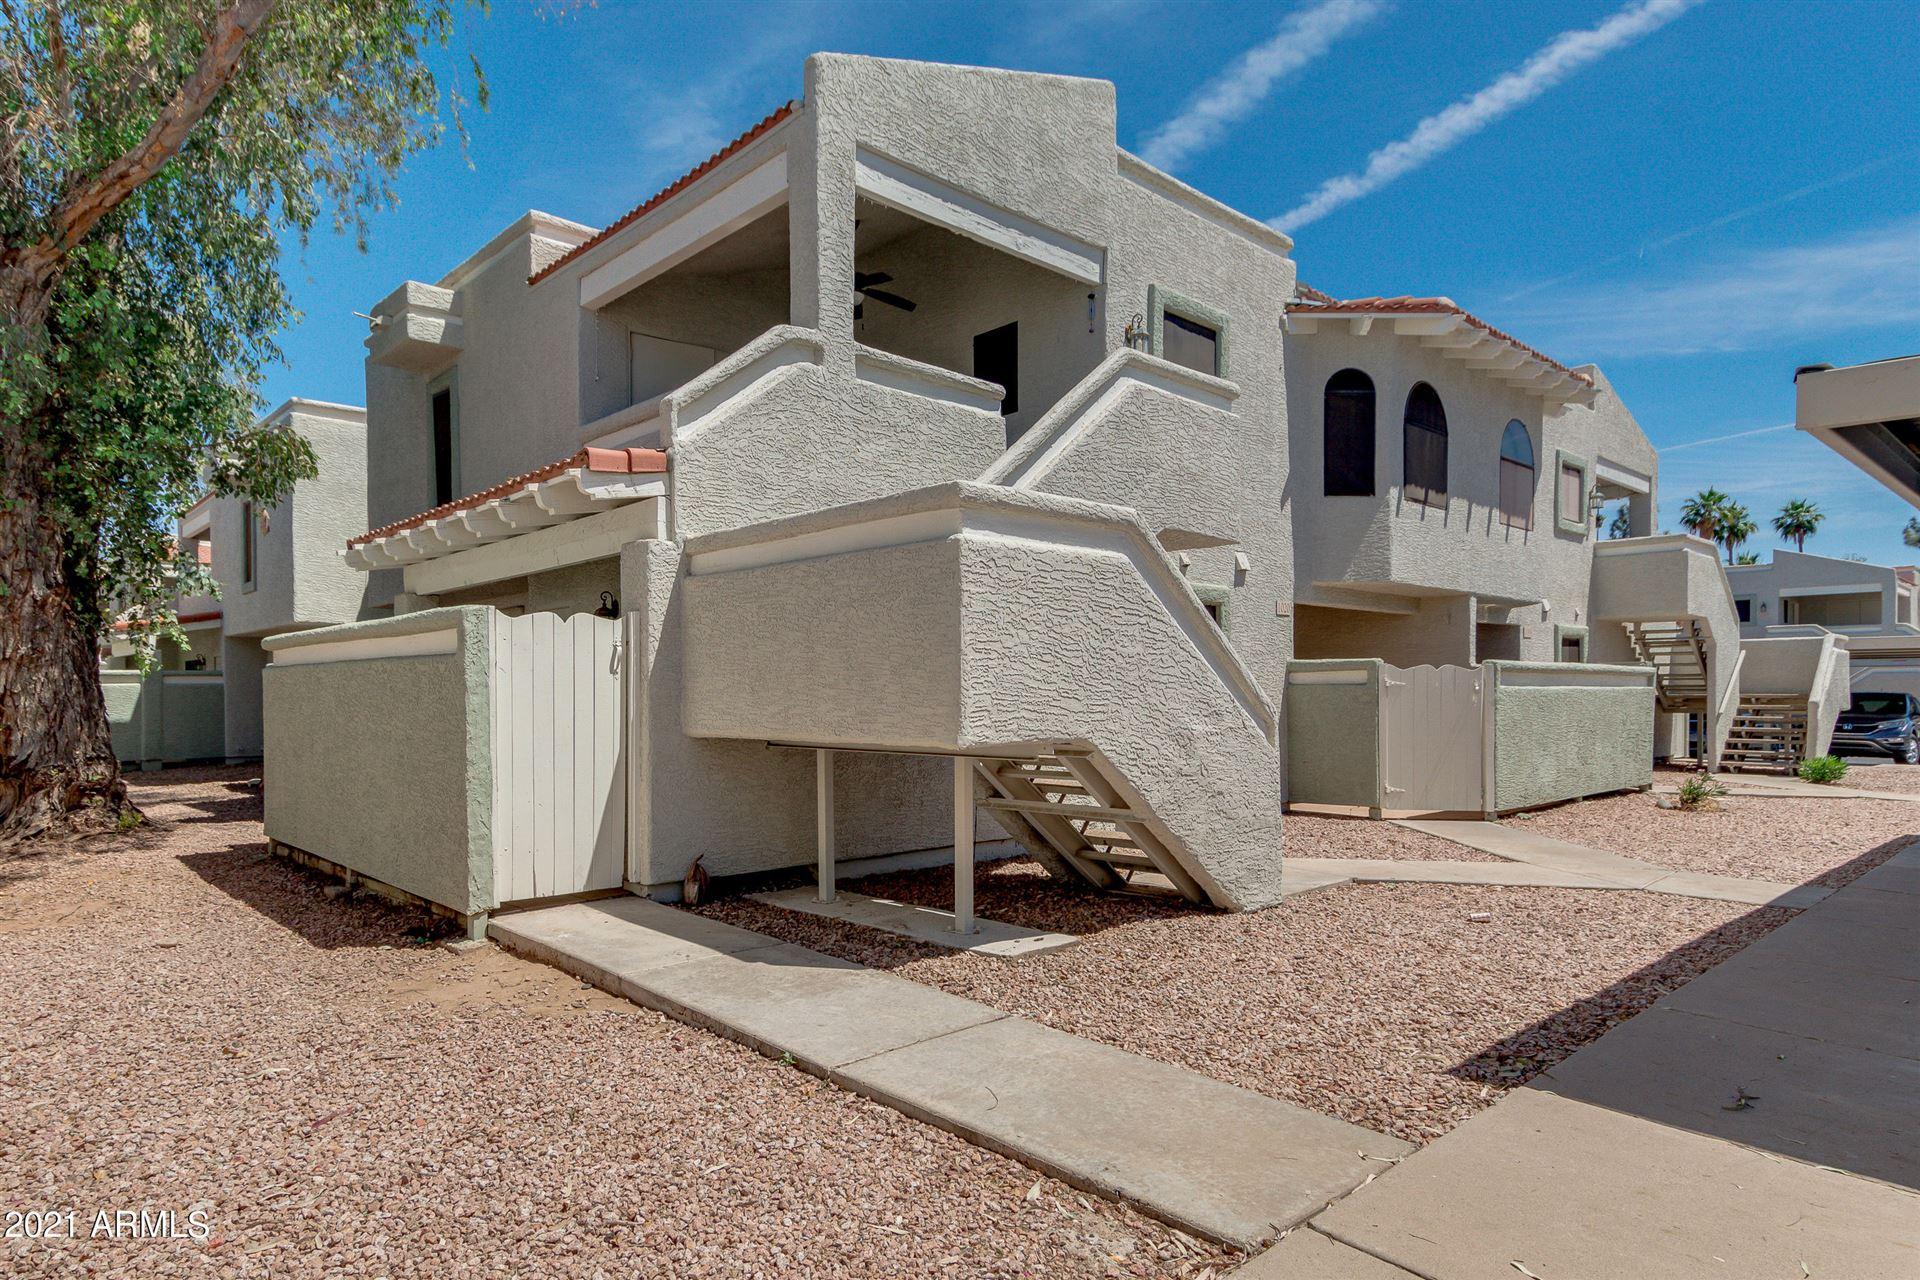 850 S RIVER Drive #1020, Tempe, AZ 85281 - MLS#: 6232732